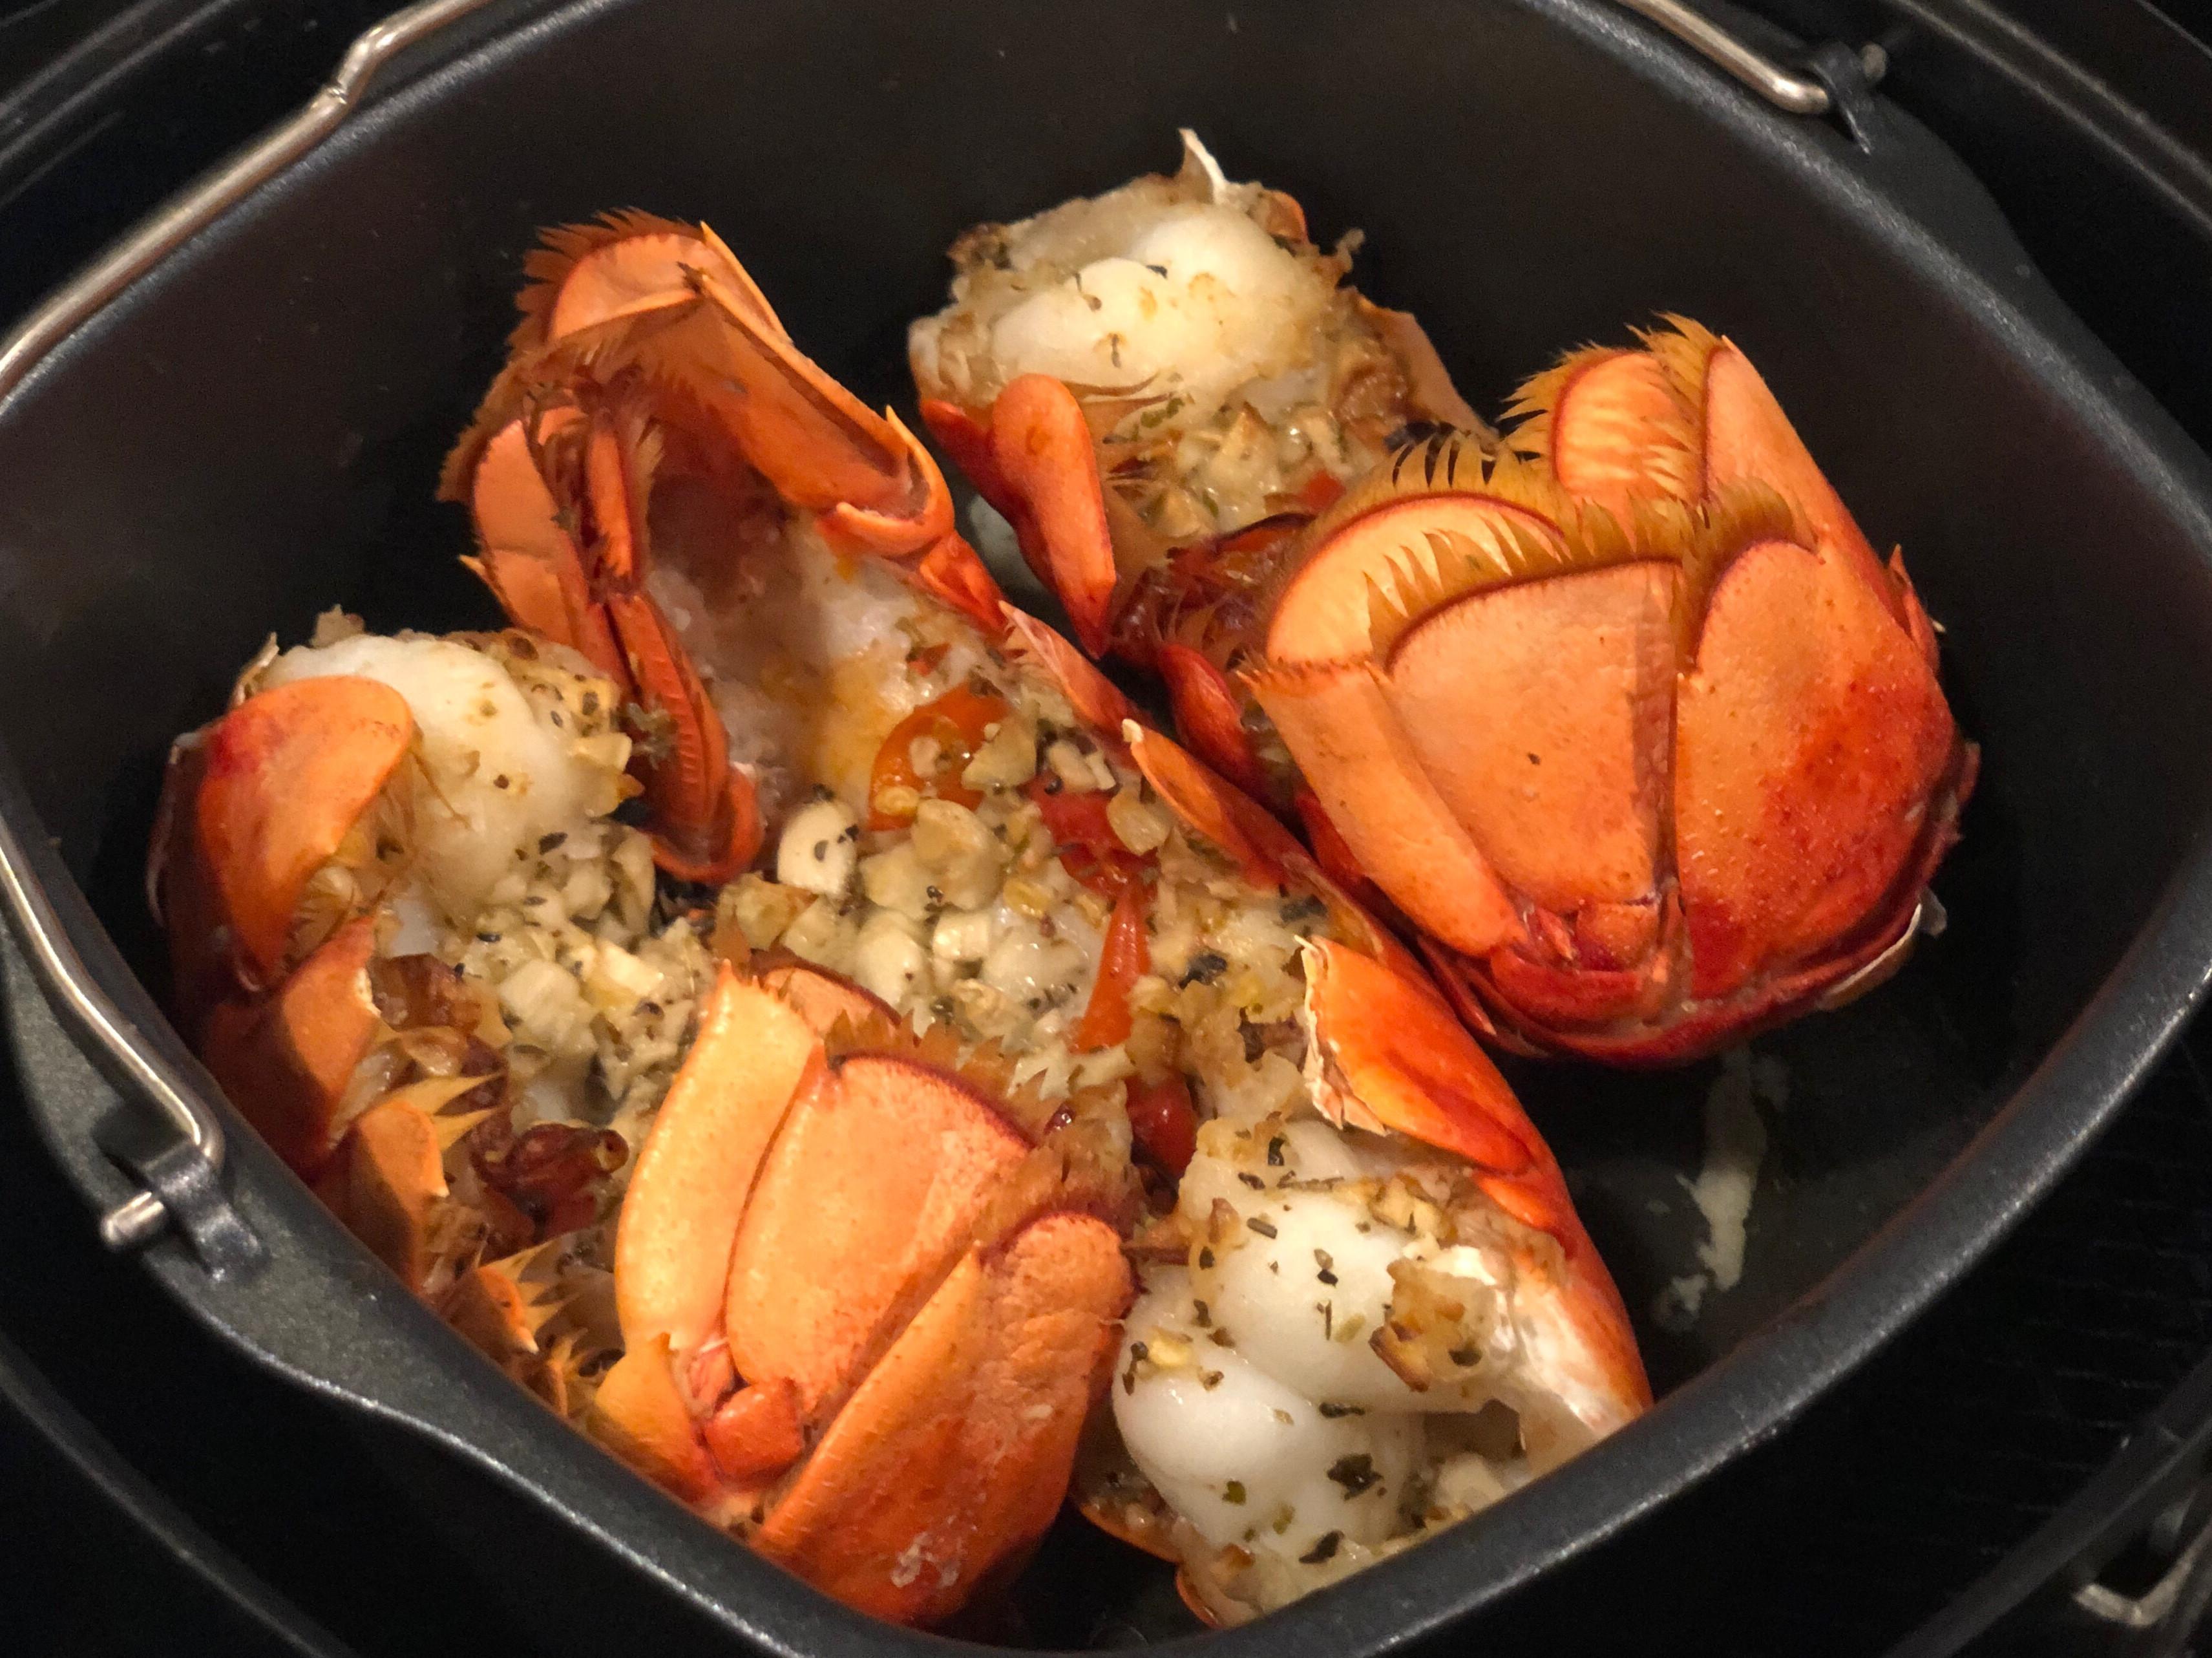 Costco 波士頓龍蝦🦞 氣炸鍋